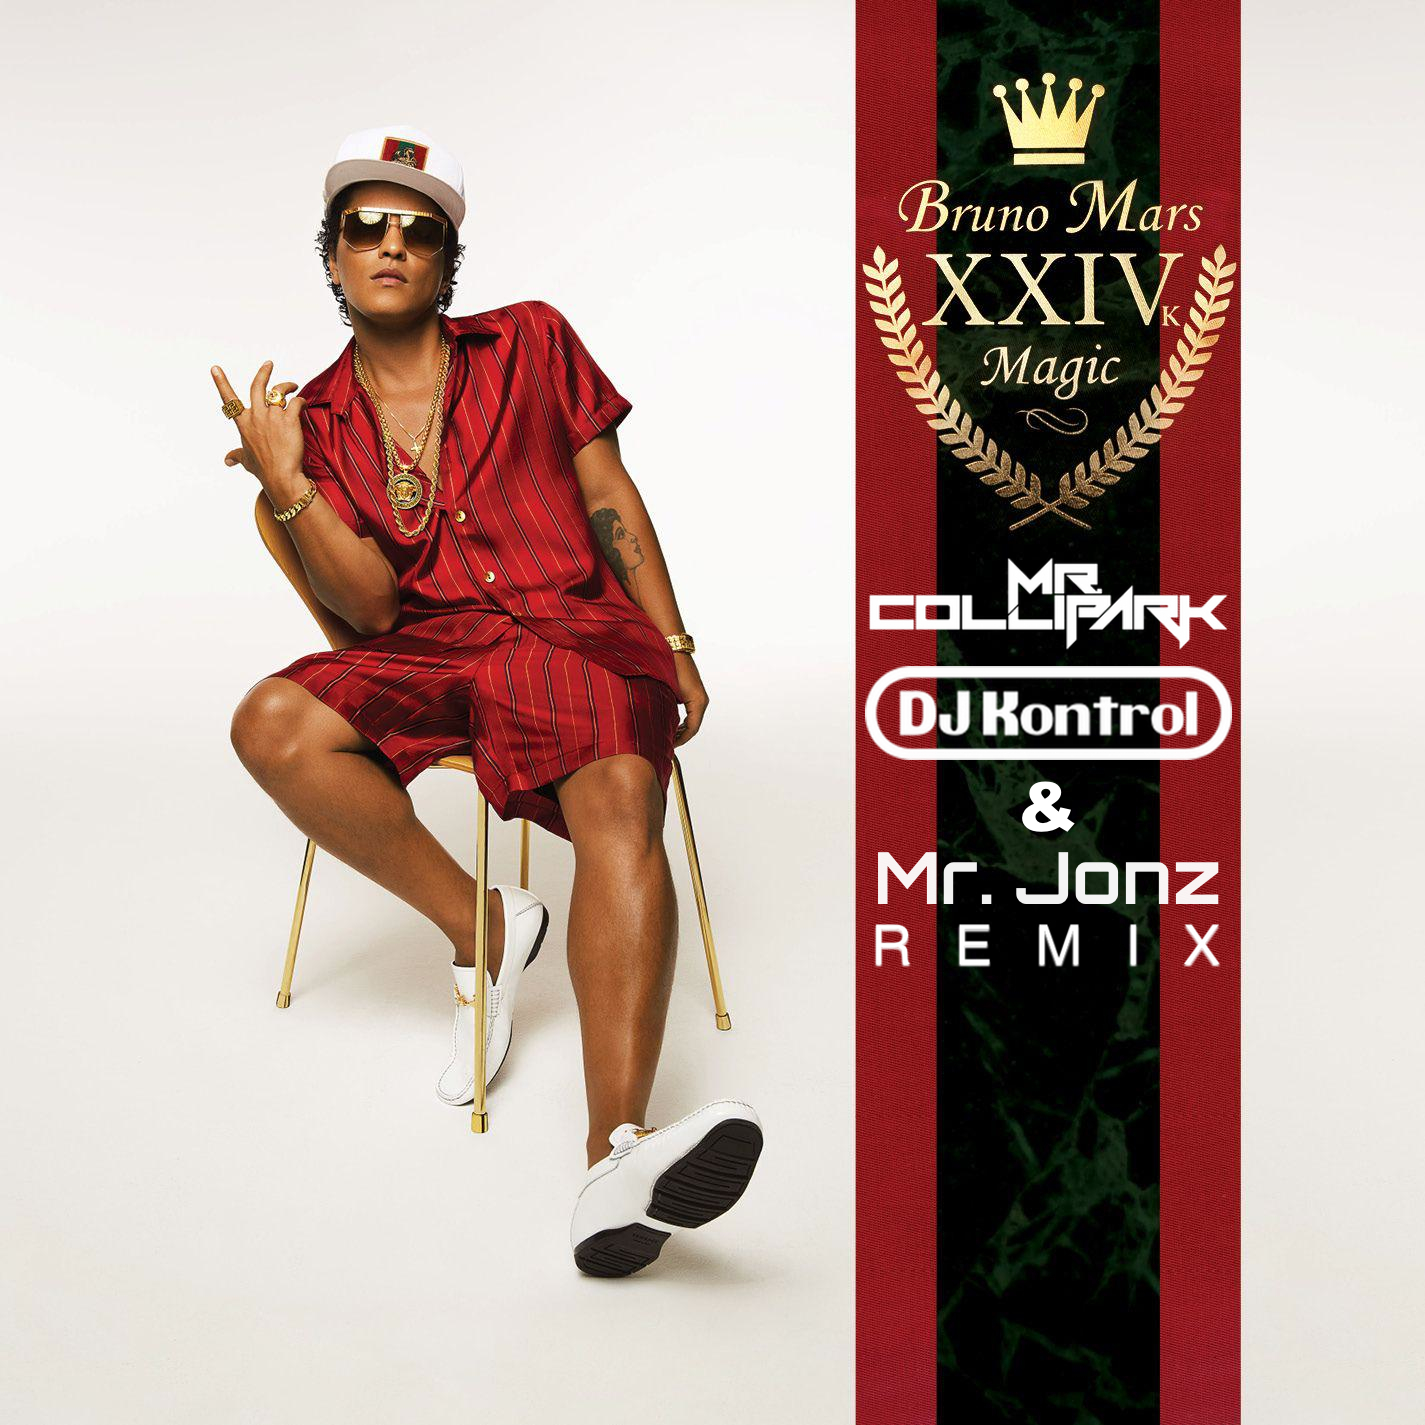 Bruno Mars - 24K Magic (Mr. Collipark, DJ Kontrol & Mr. Jonz Remix)